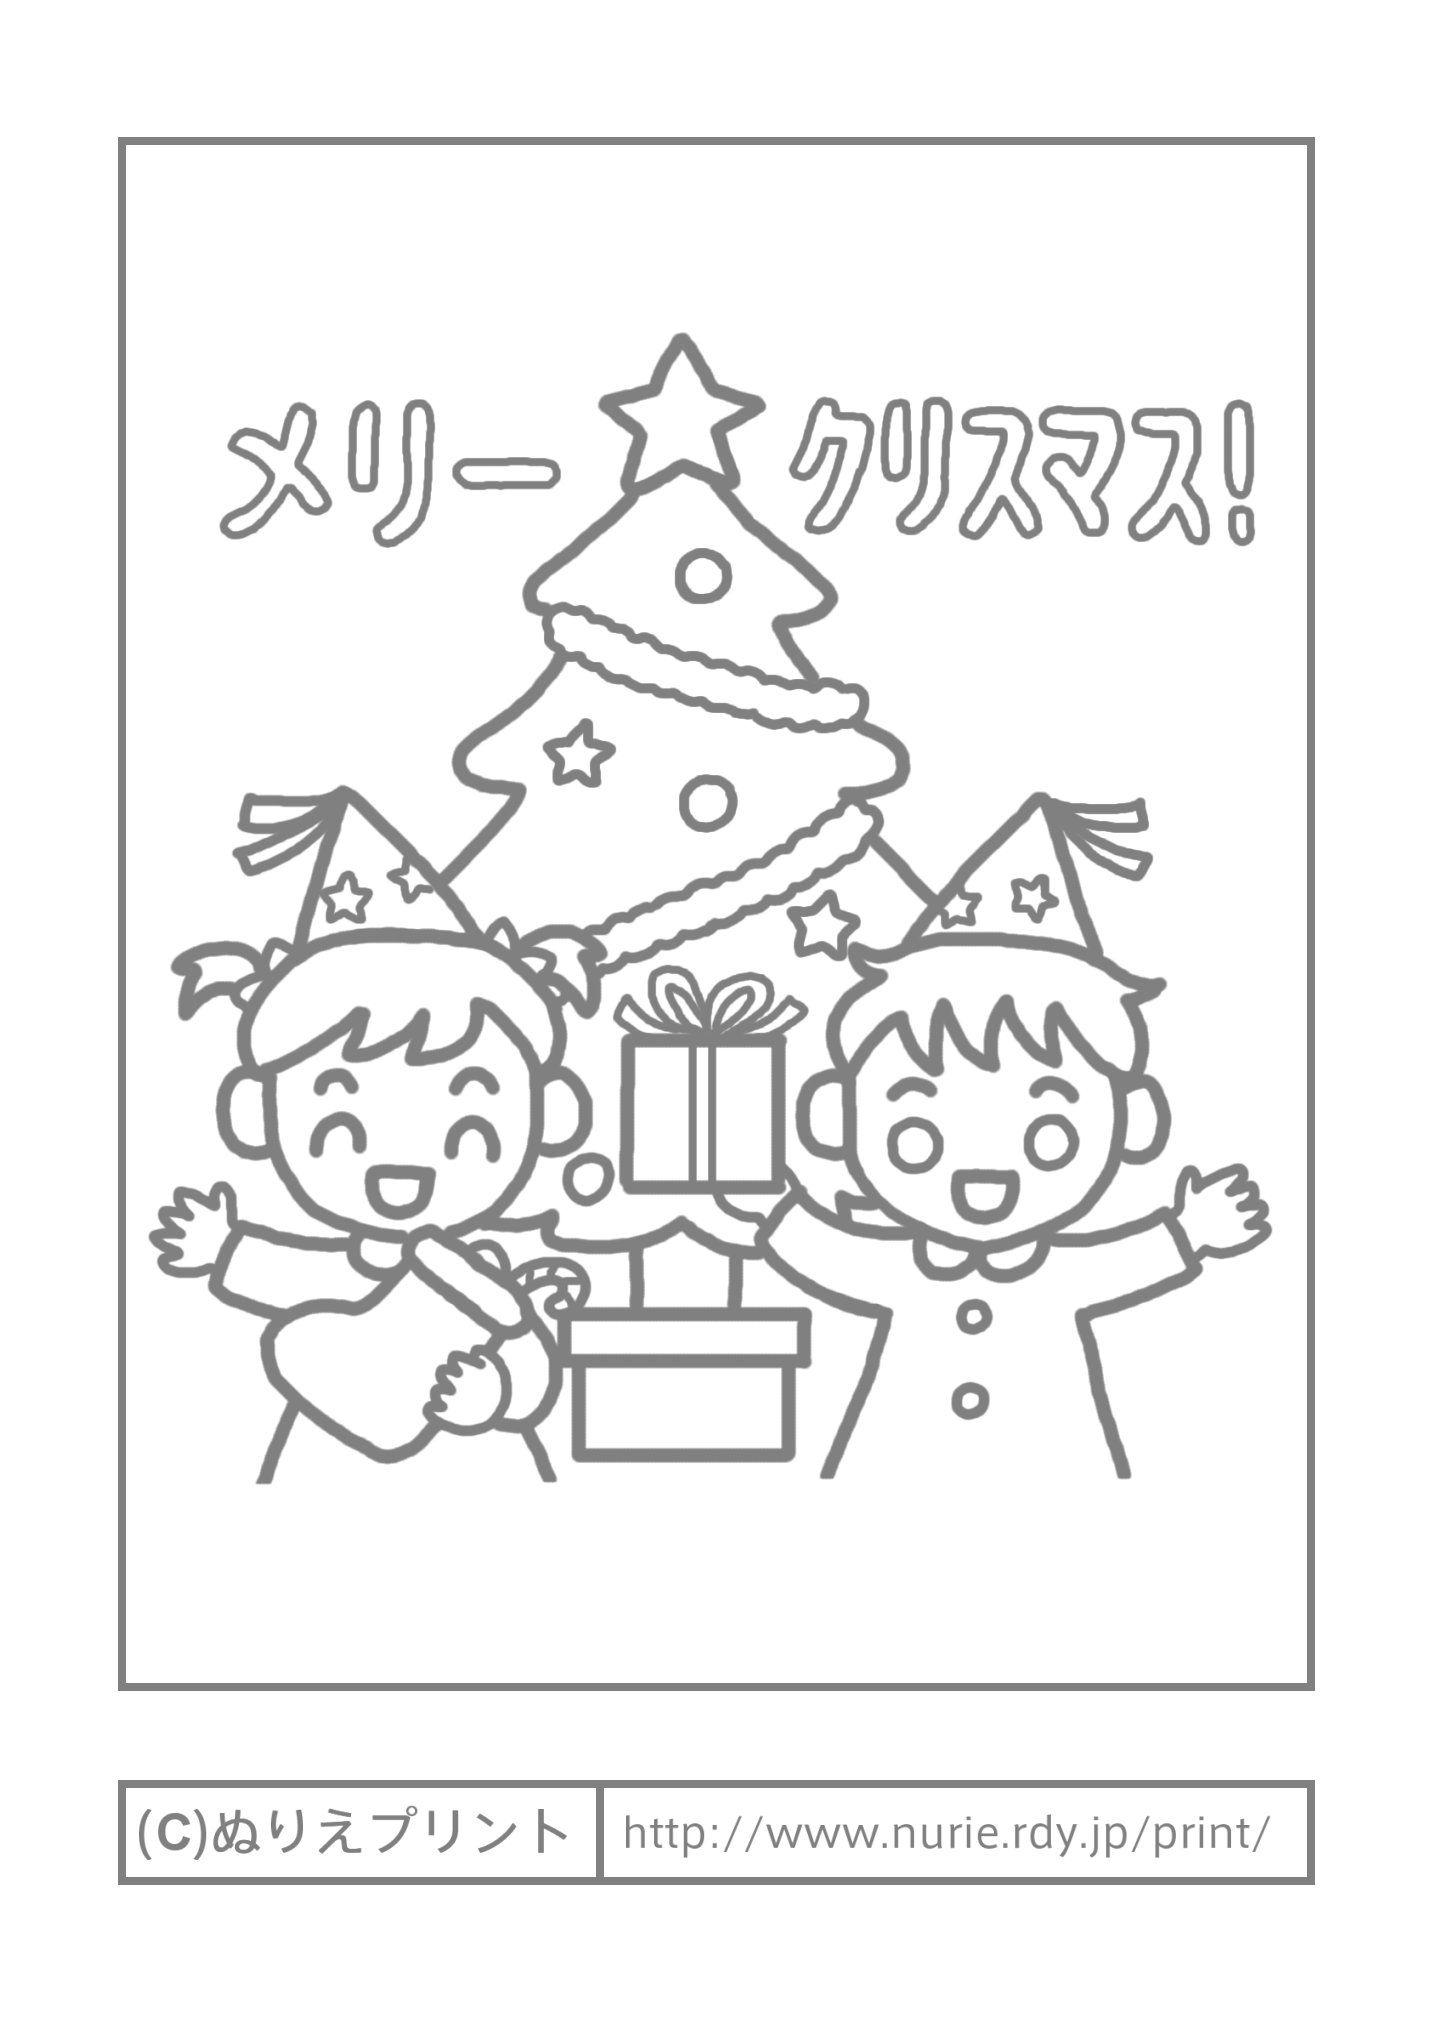 Kids Nurie 最も気に入った クリスマス ぬりえ こども クリスマス 塗り絵 クリスマス ページ クリスマス 無料